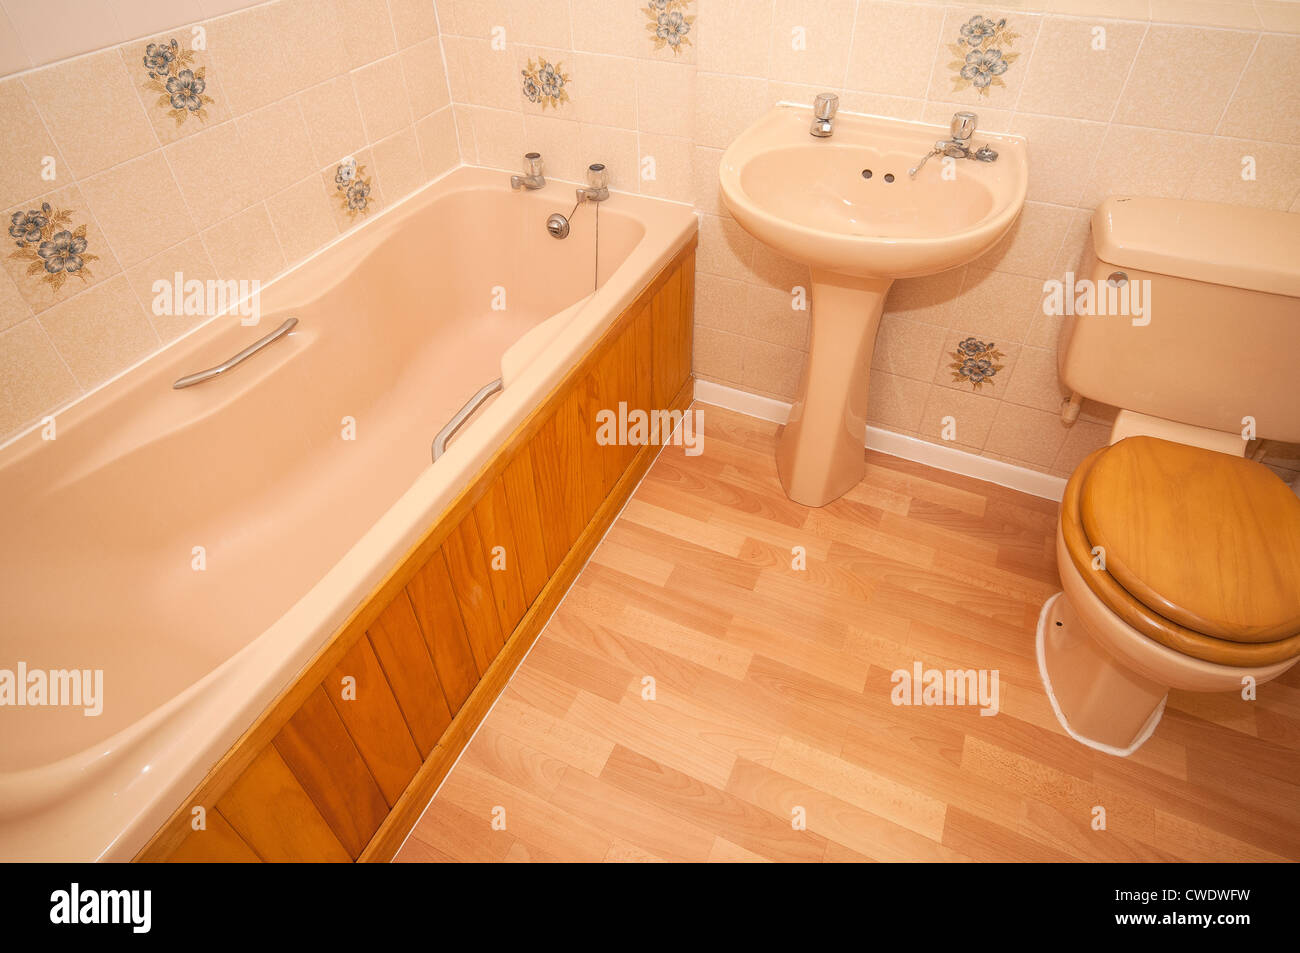 Eighties style bathroom suite - Stock Image